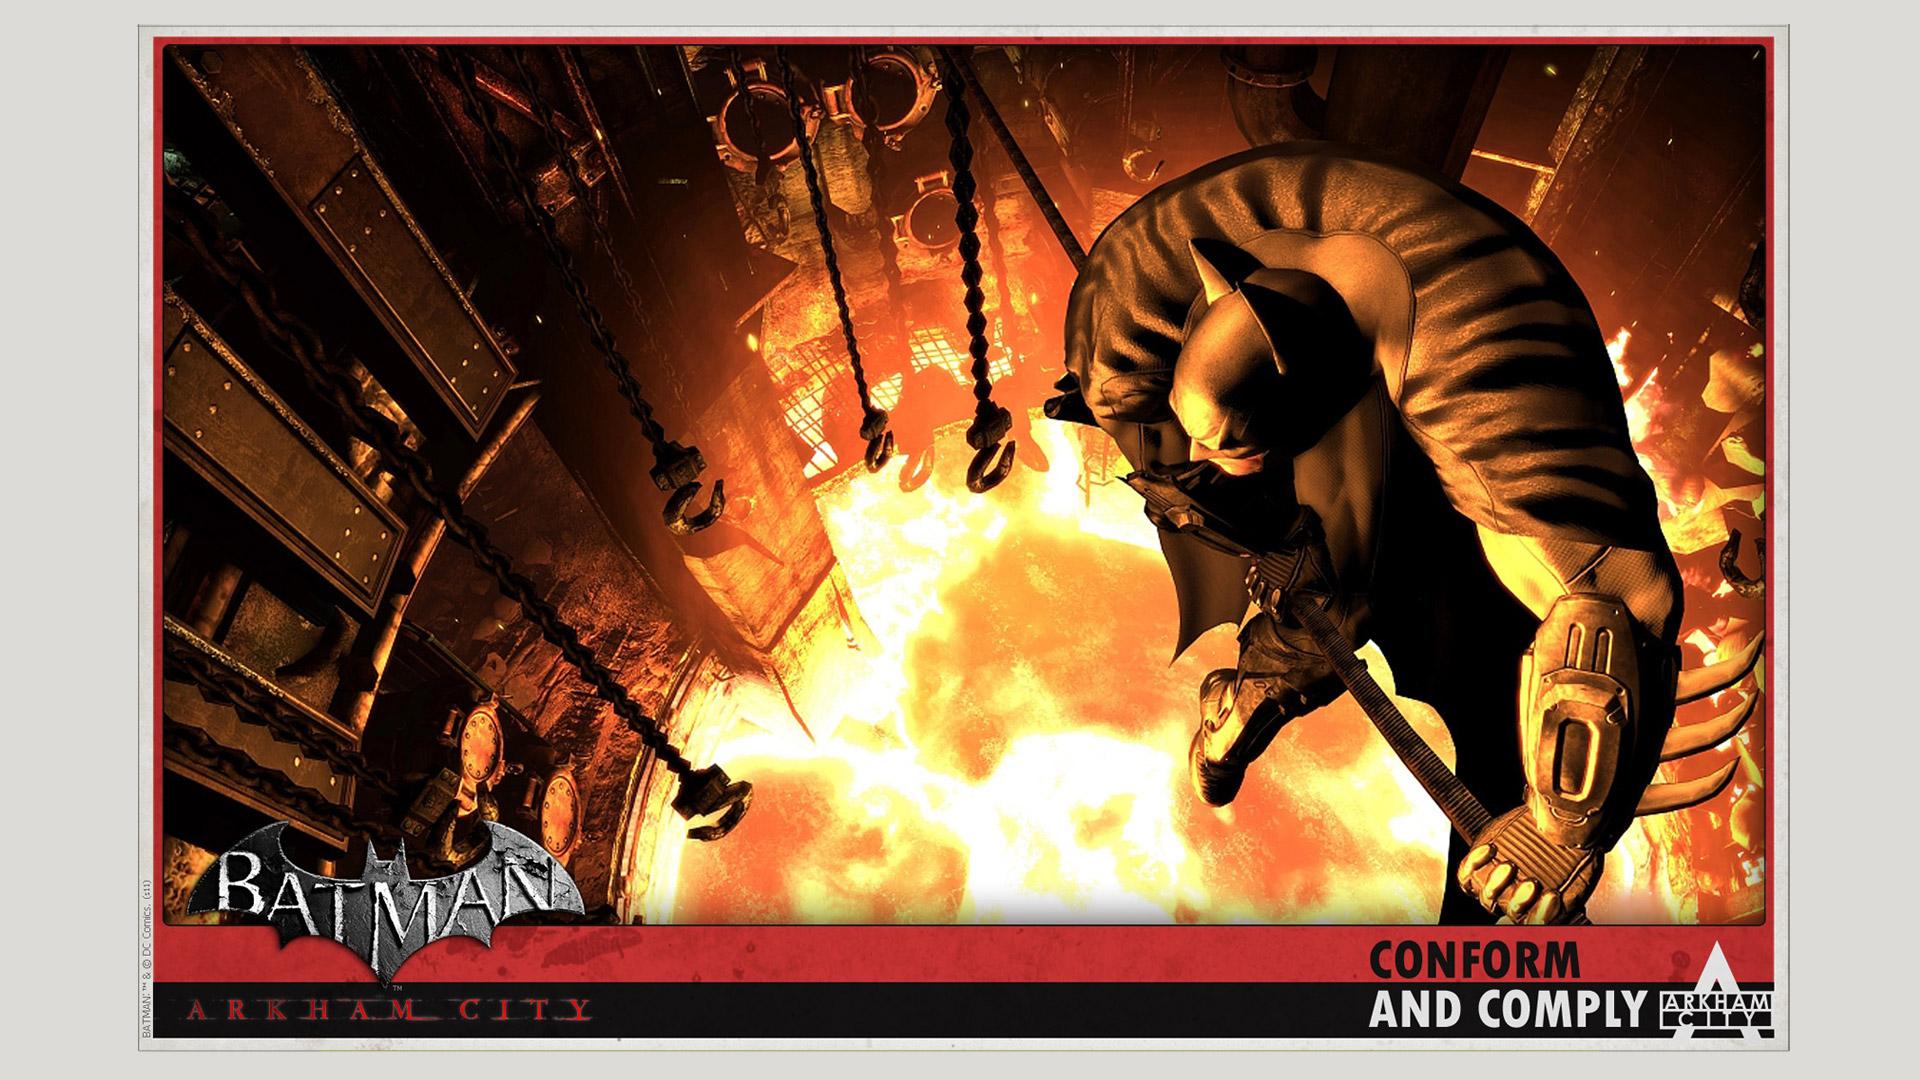 Free Batman: Arkham City Wallpaper in 1920x1080